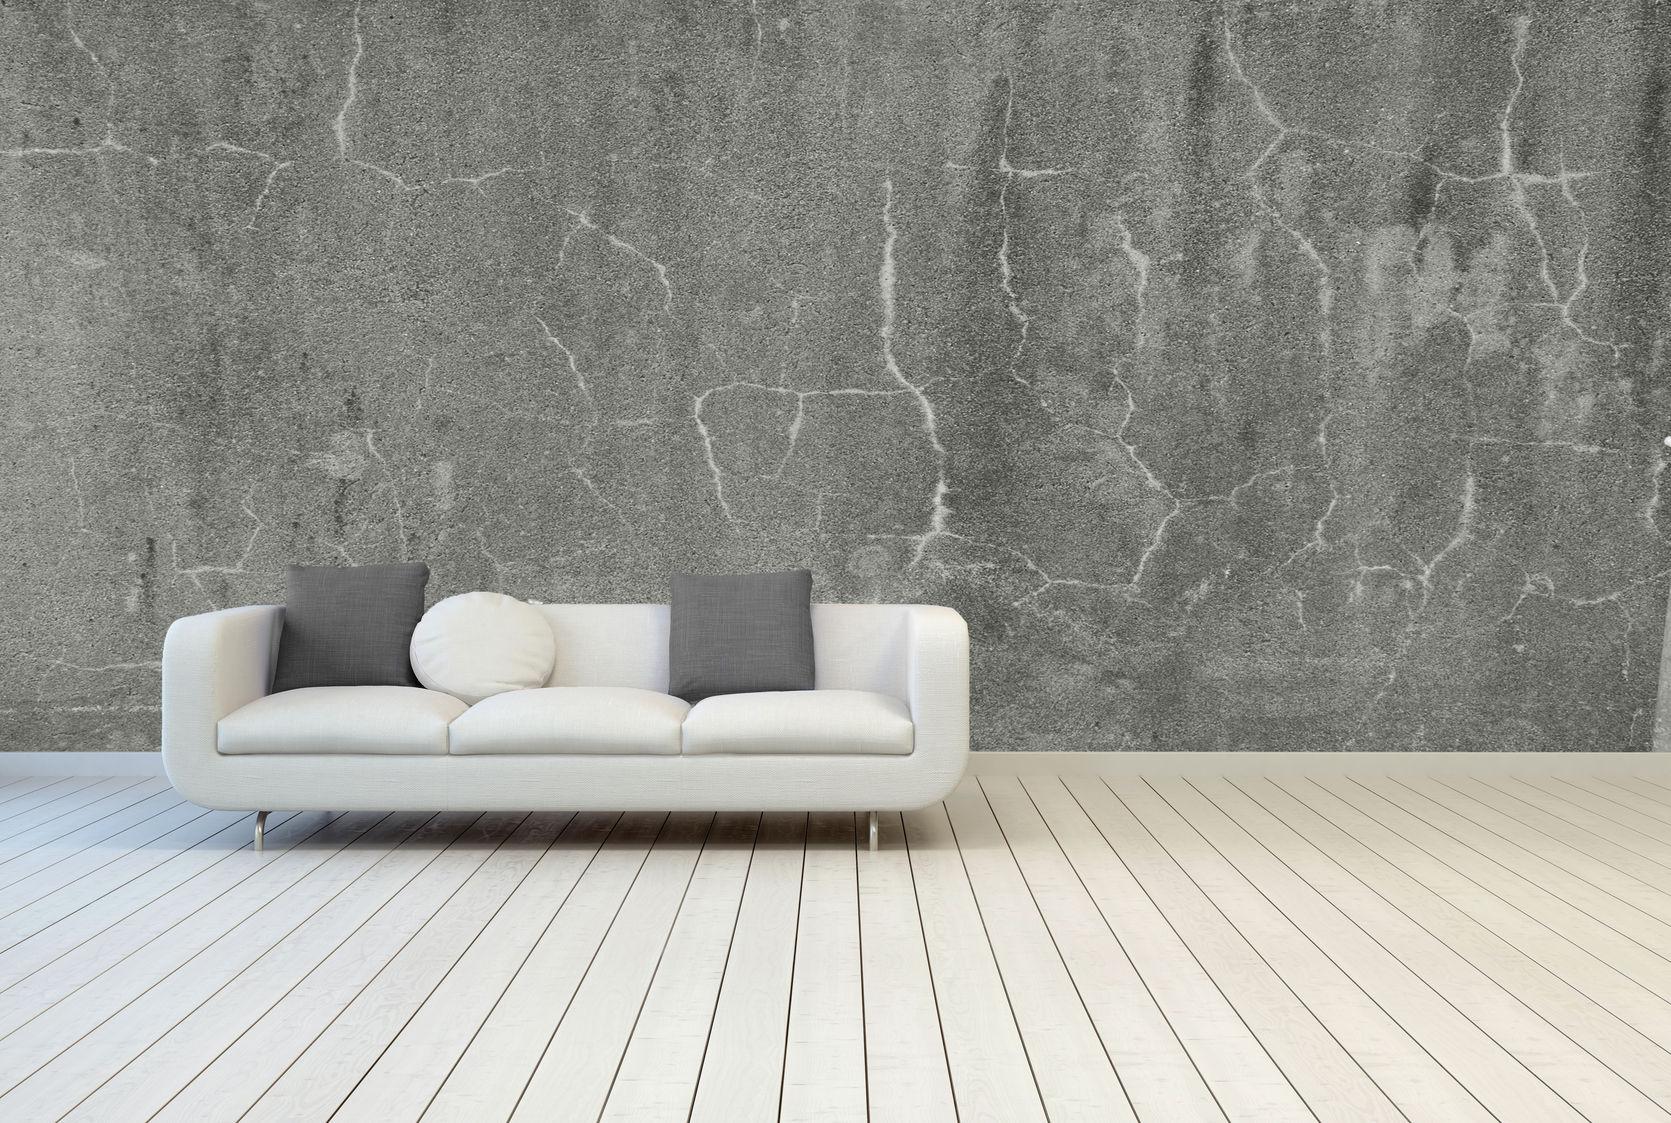 gray textured walls